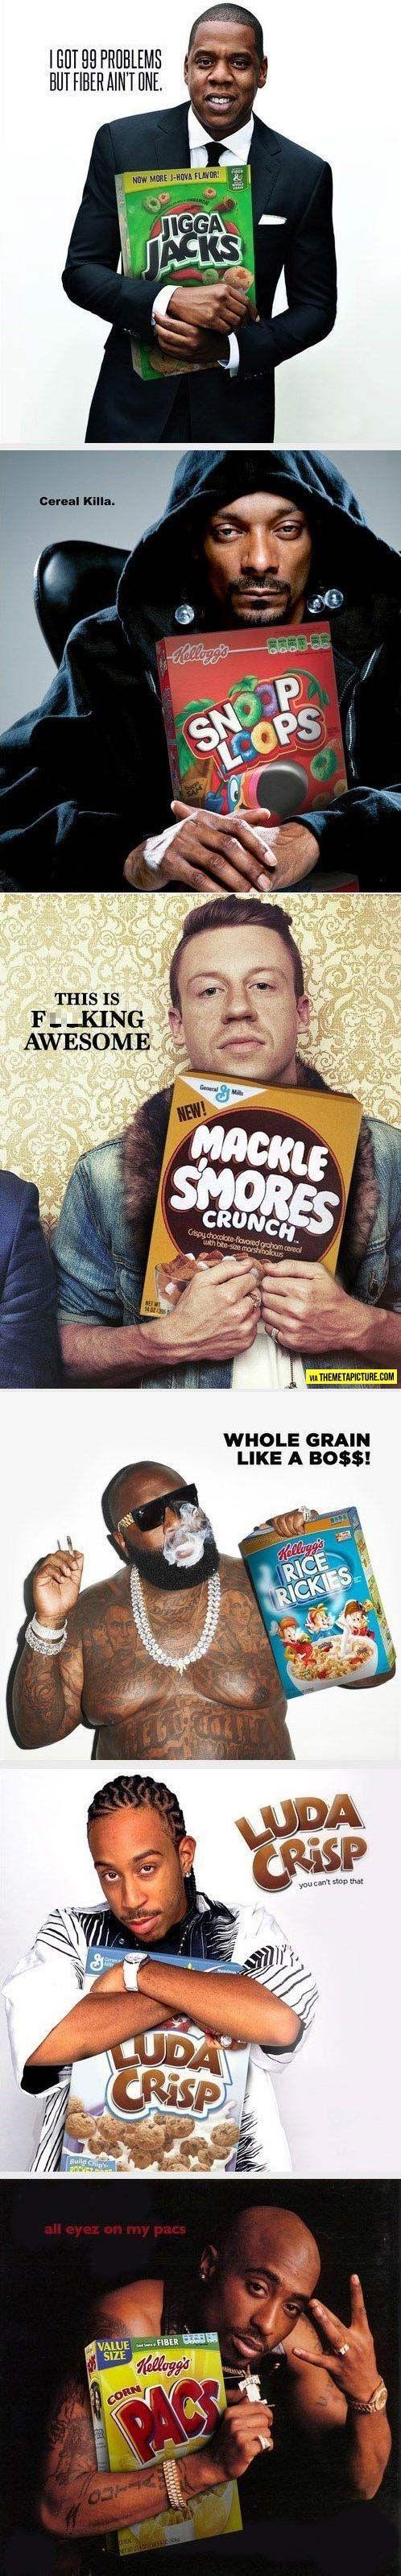 Macklesmores!